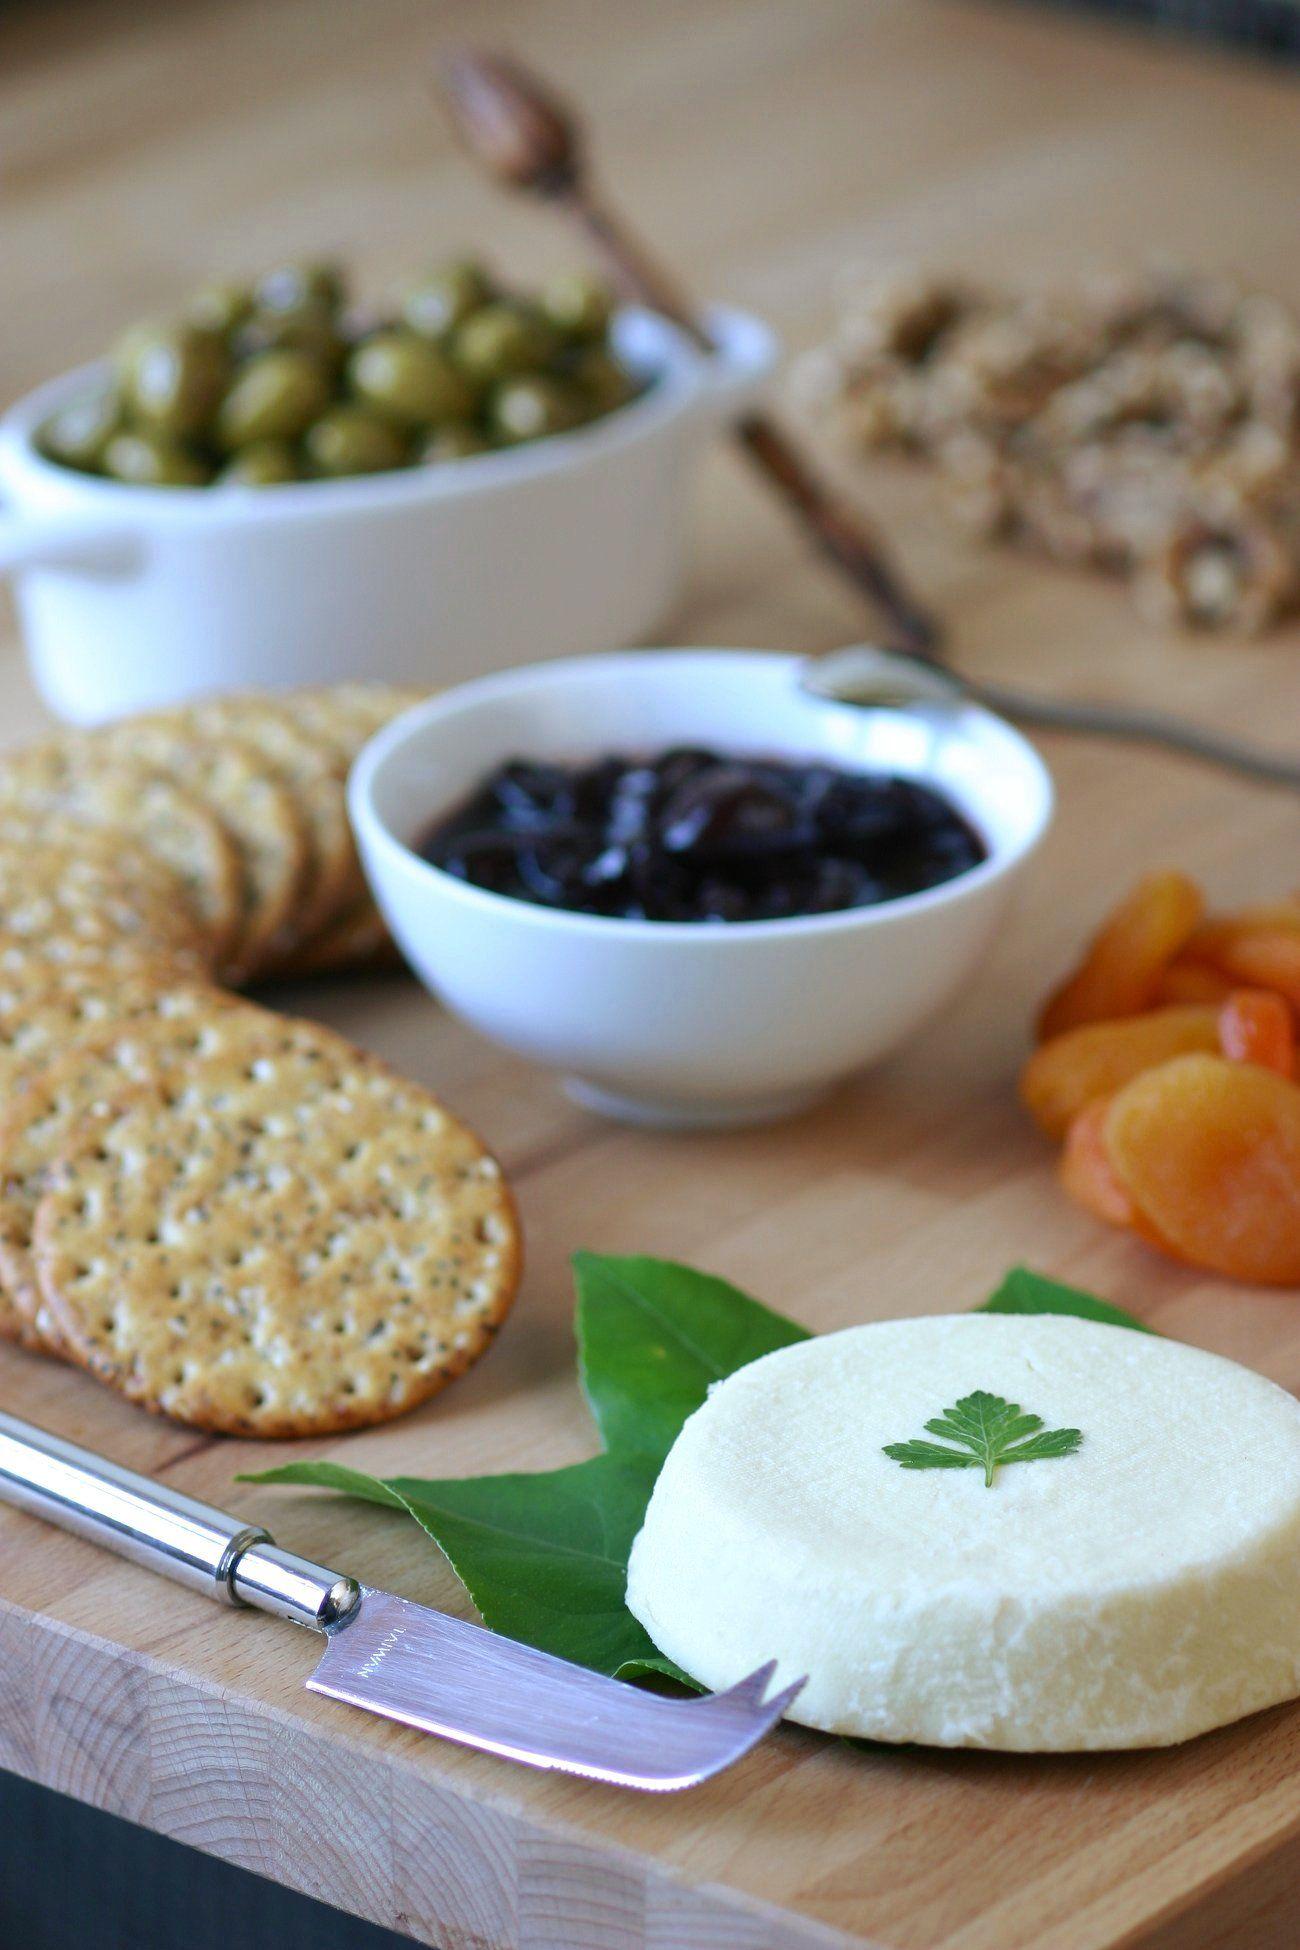 Amazing Vegan Cheese With One Secret Ingredient You Never Heard Of Vegan Cheese Creamy Vegan Dishes Vegan Cheese Recipes Vegan Cheese